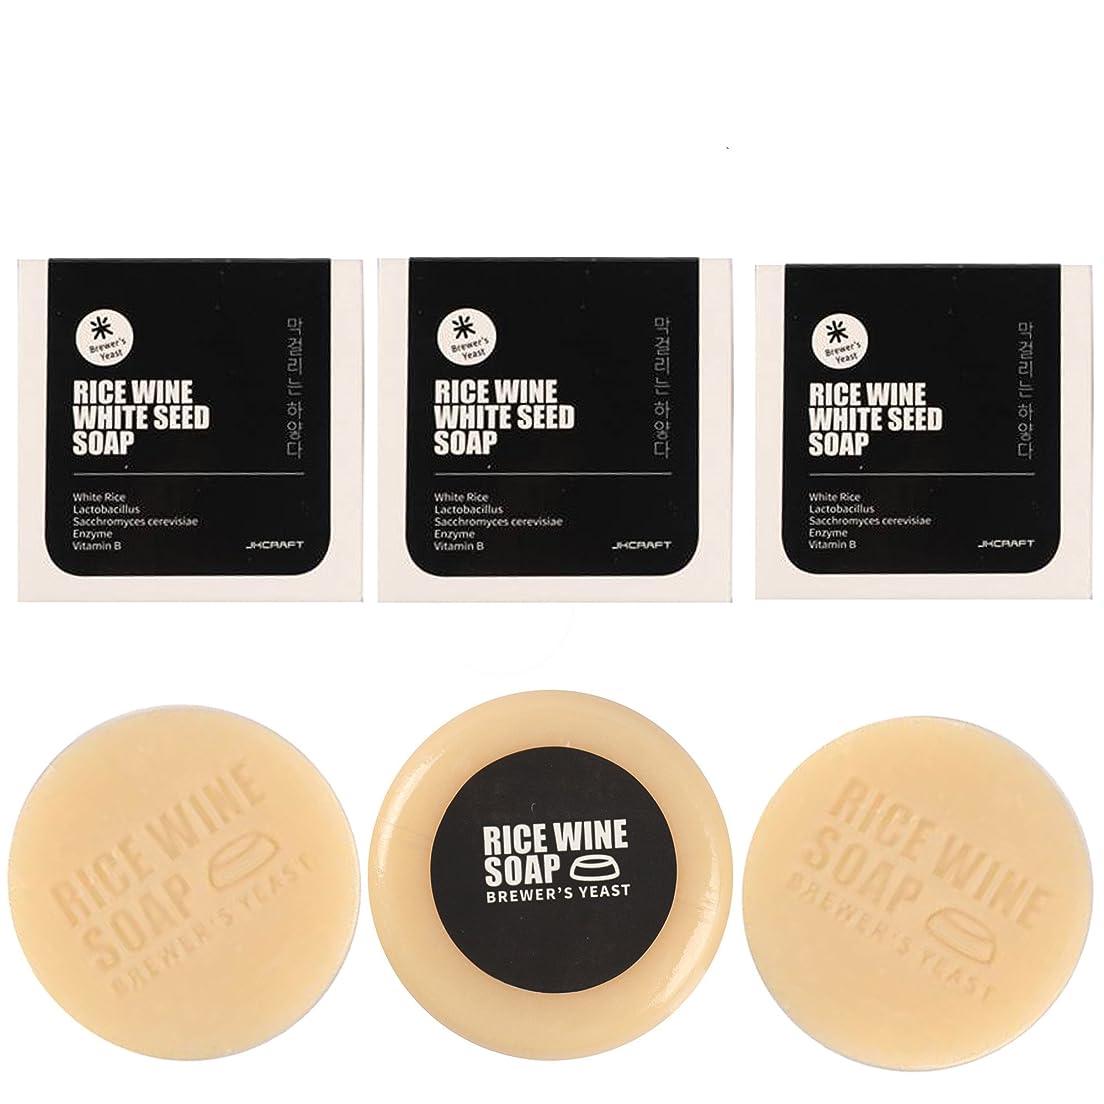 障害上院支配的JKCRAFT RICEWINE WHITE SEED SOAP マッコリ酵母石鹸 3pcs [並行輸入品]マッコリ酵母石鹸,無添加,無刺激,天然洗顔石鹸